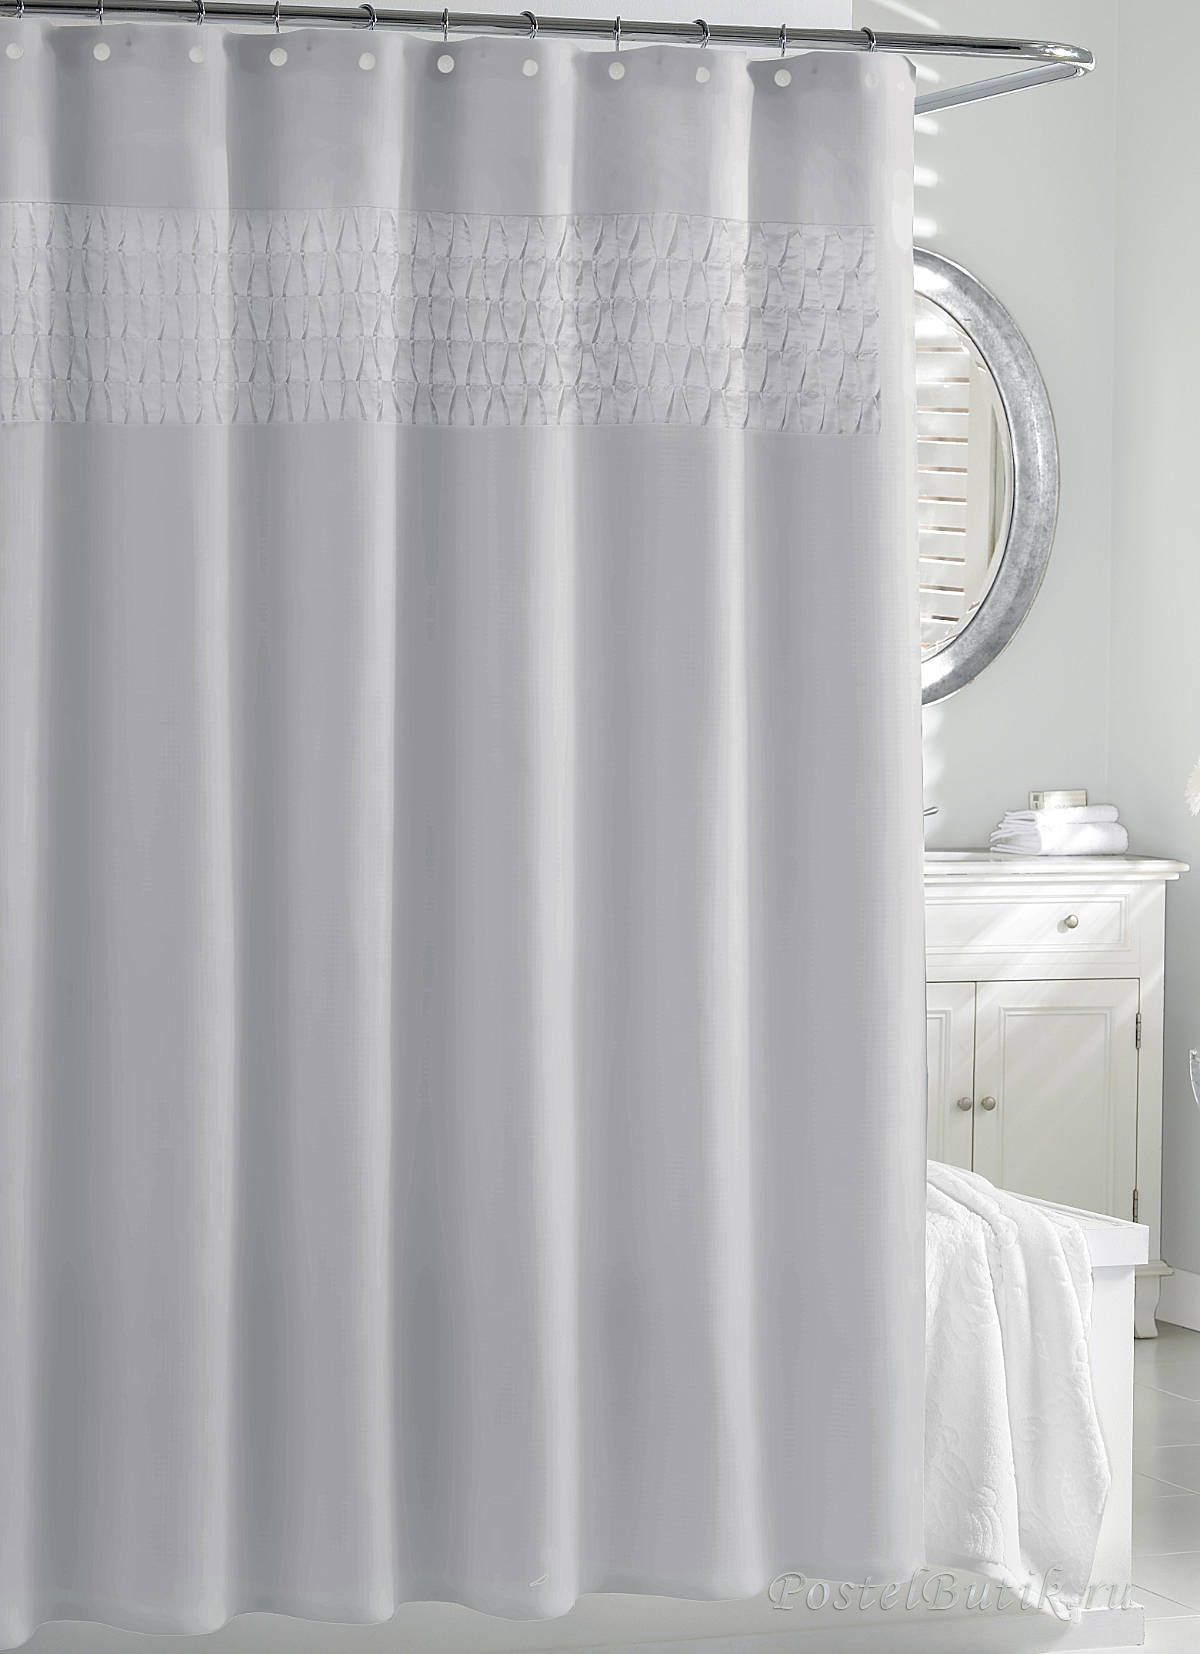 Шторки Элитная шторка для ванной Smock Pleat Silver от Kassatex elitnaya-shtorka-dlya-vannoy-smock-pleat-silver-ot-kassatex-portugaliya.jpeg